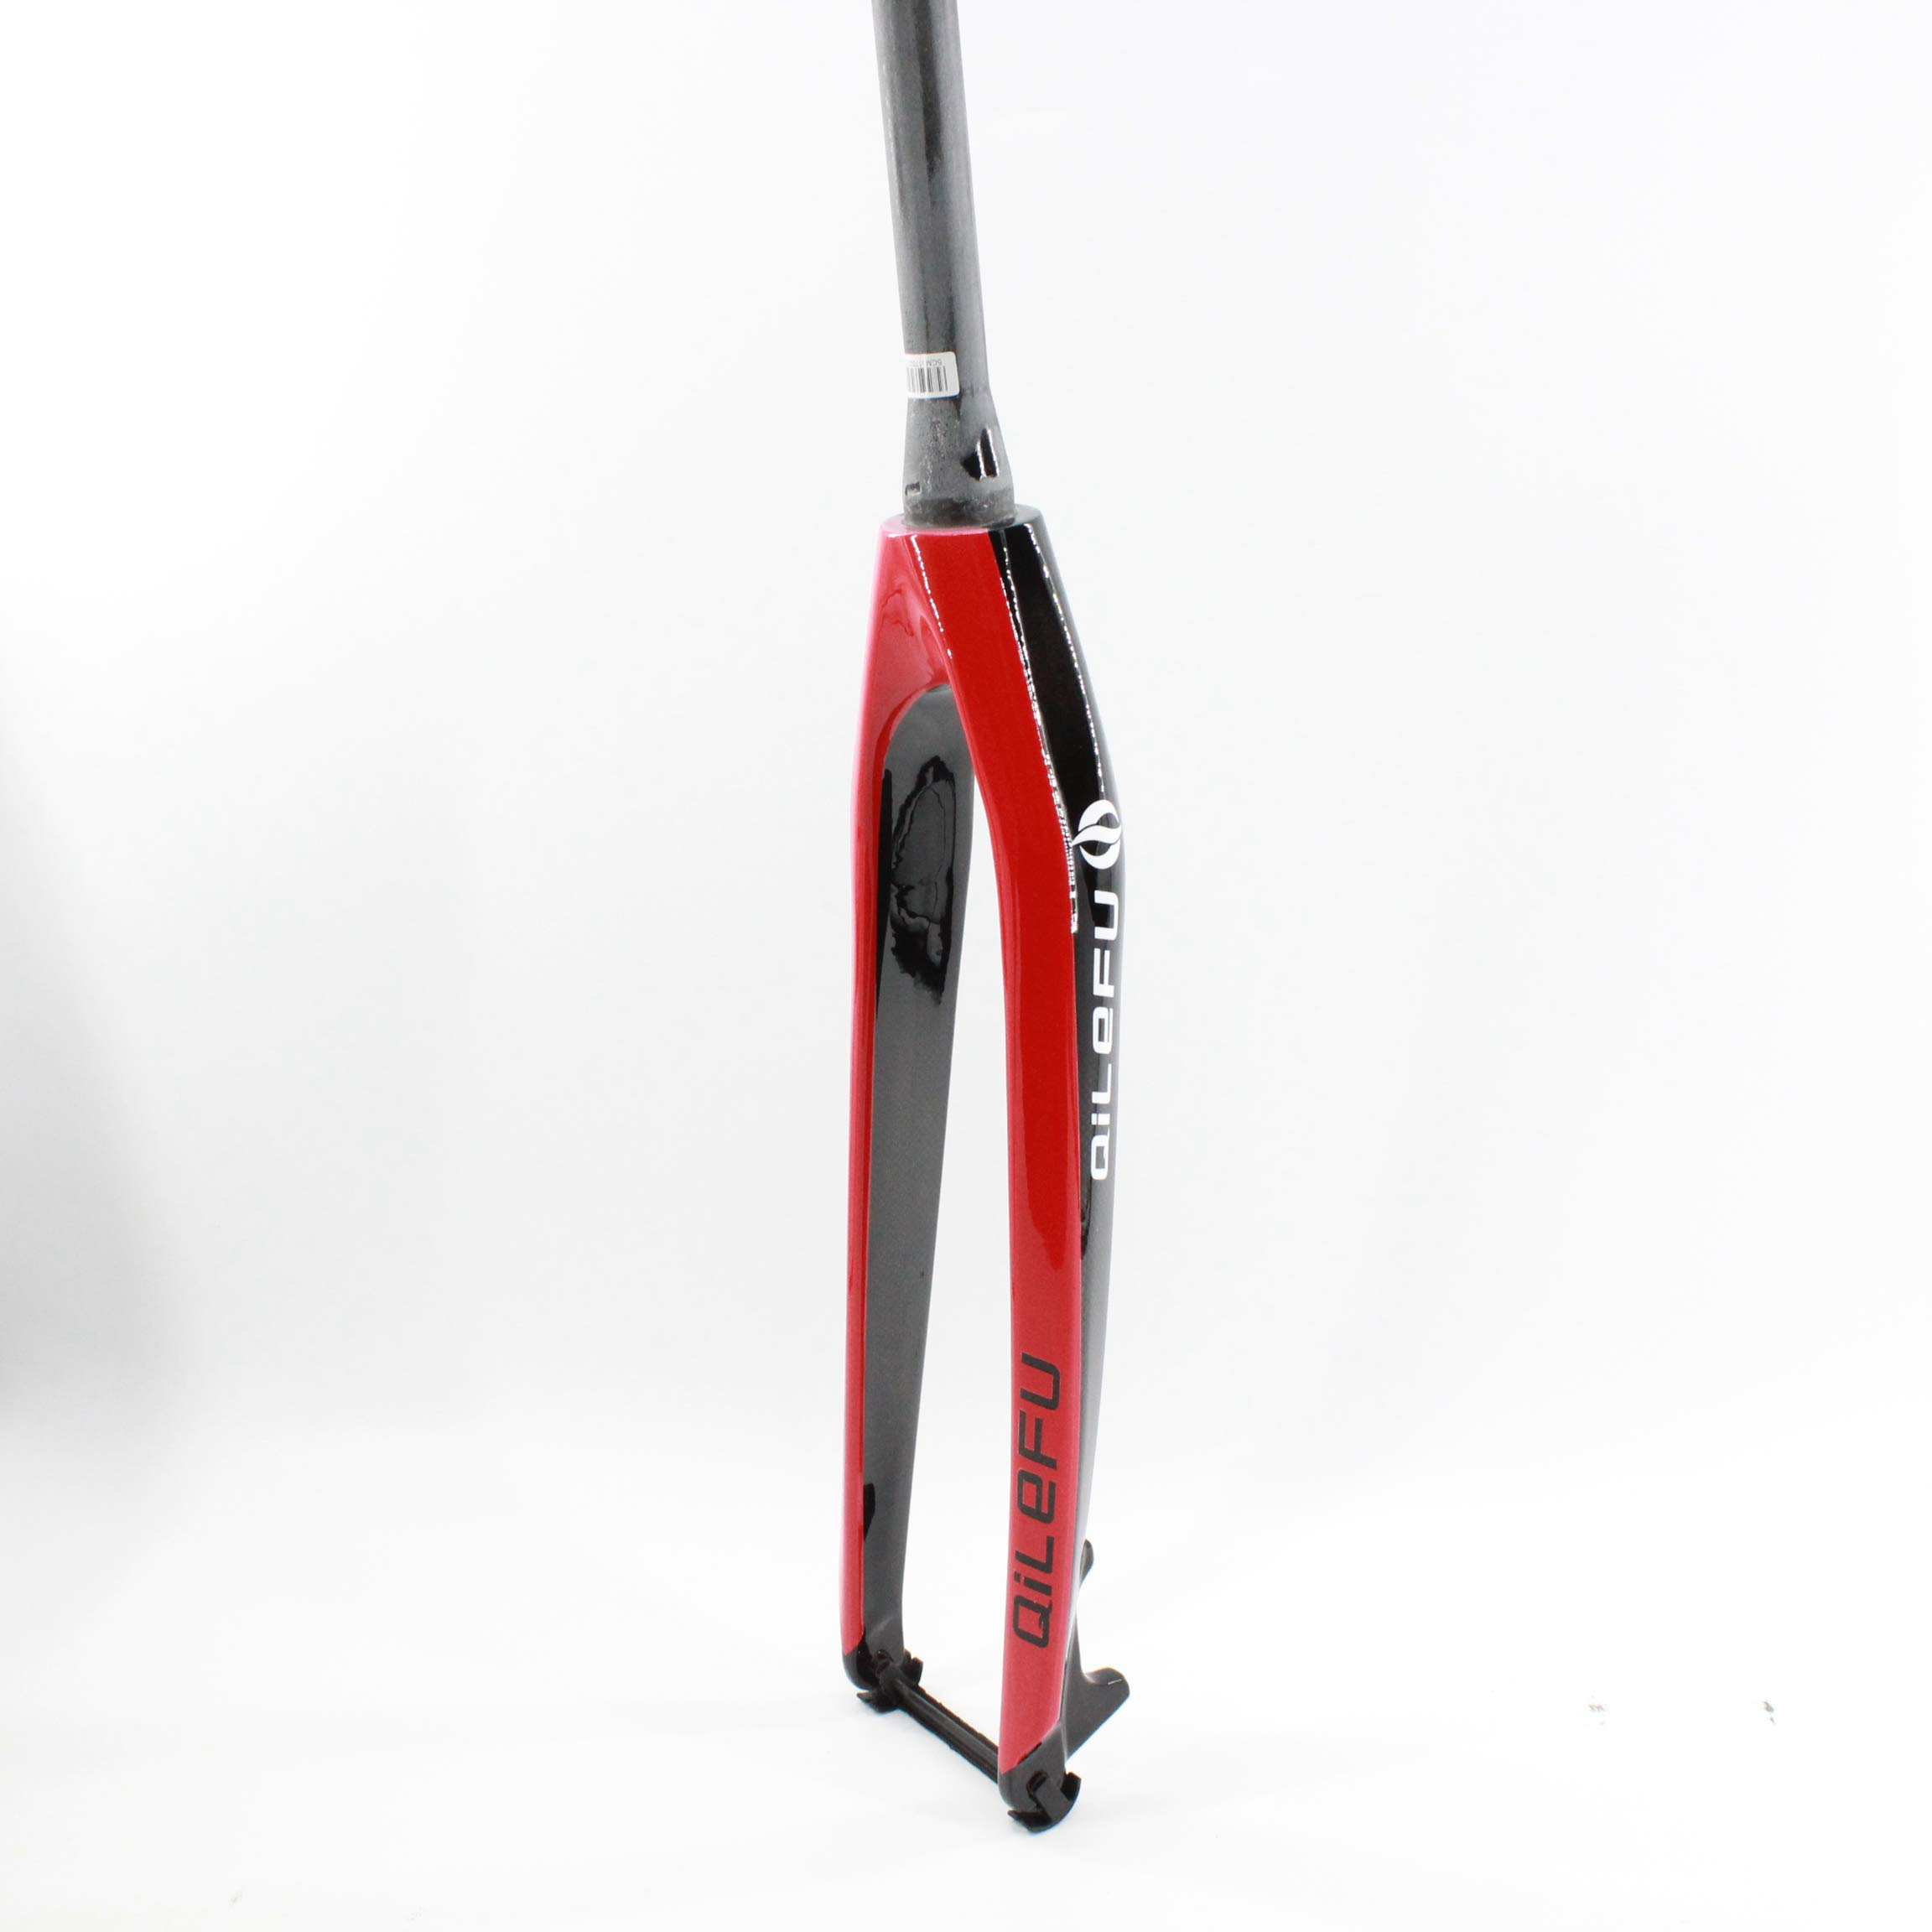 QILEFU 26/27.5/29'' inch Mountain Bicycle Full Carbon Bike Front Fork disc Brake Tapered Tube MTB 26/27.5/29er (red, 26er) by QILEFU